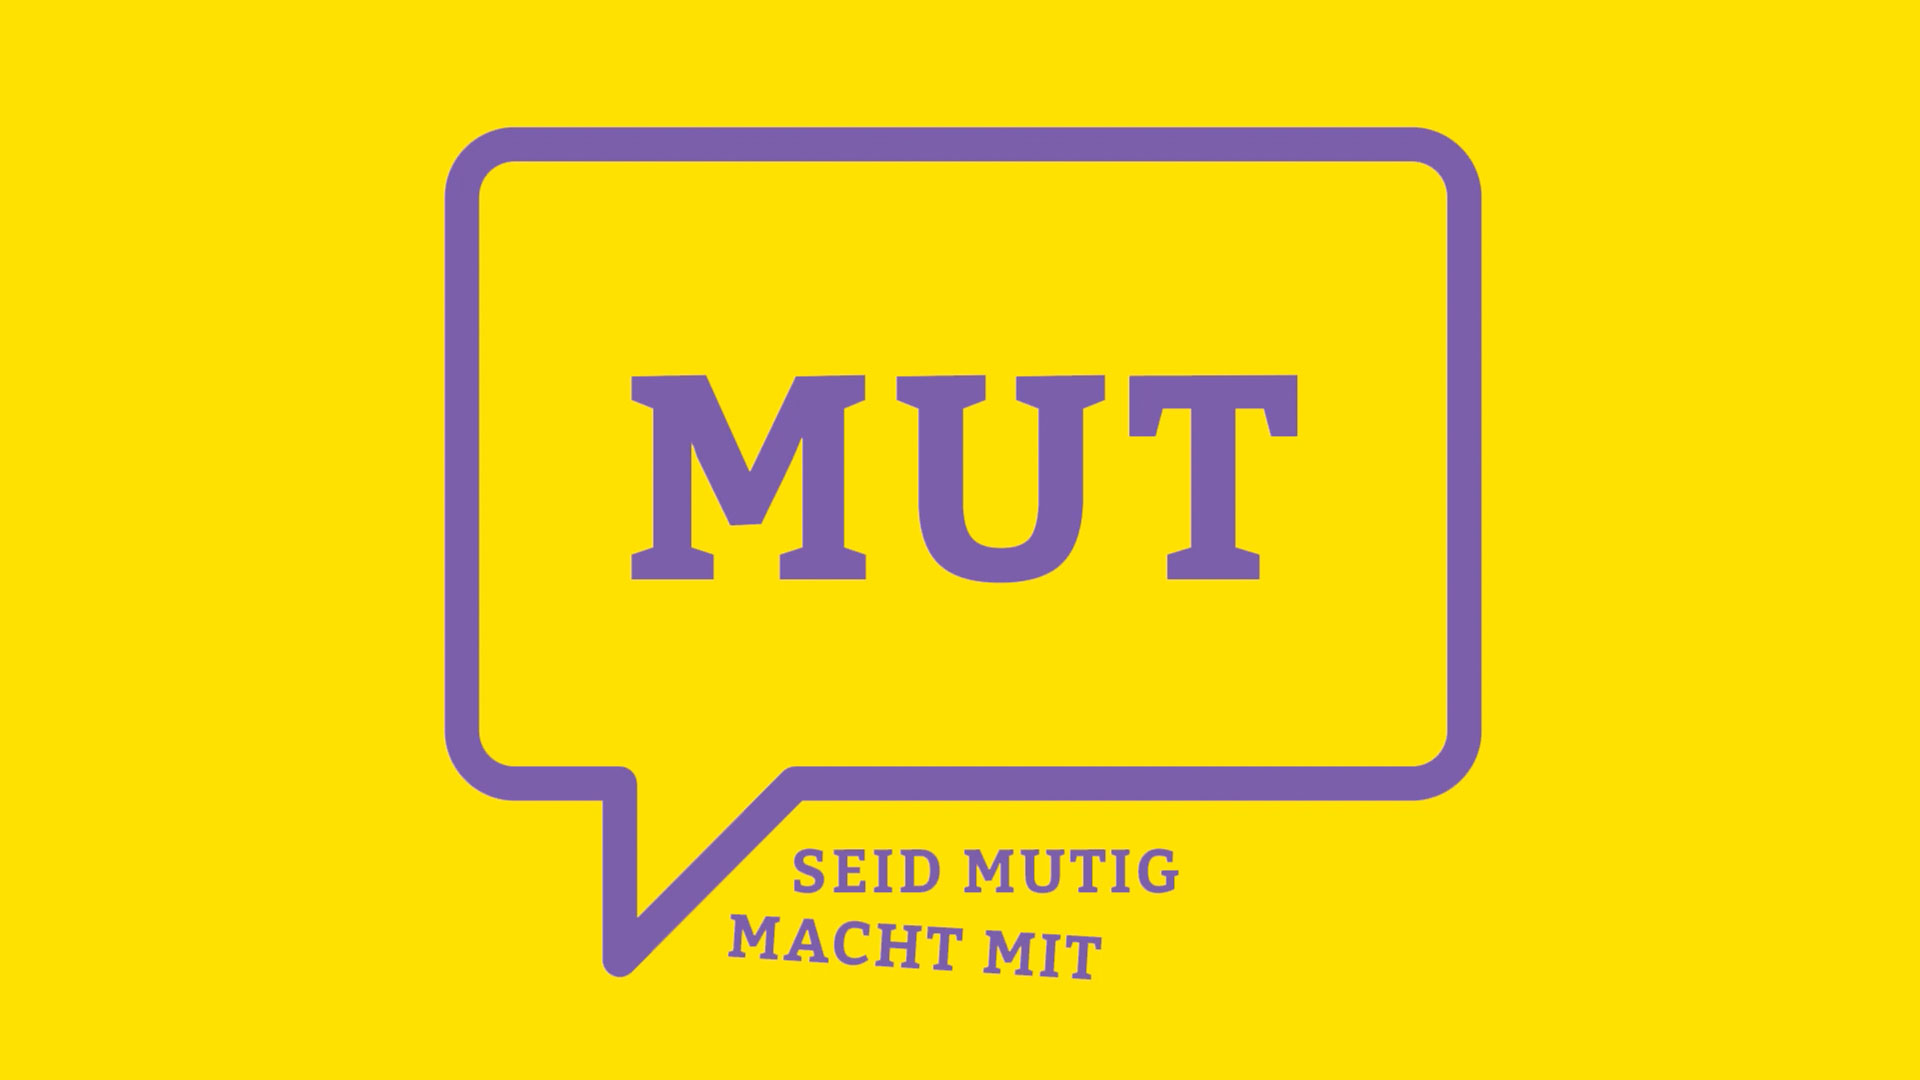 animo-film-mut-logo-seid-mutig-macht-mit